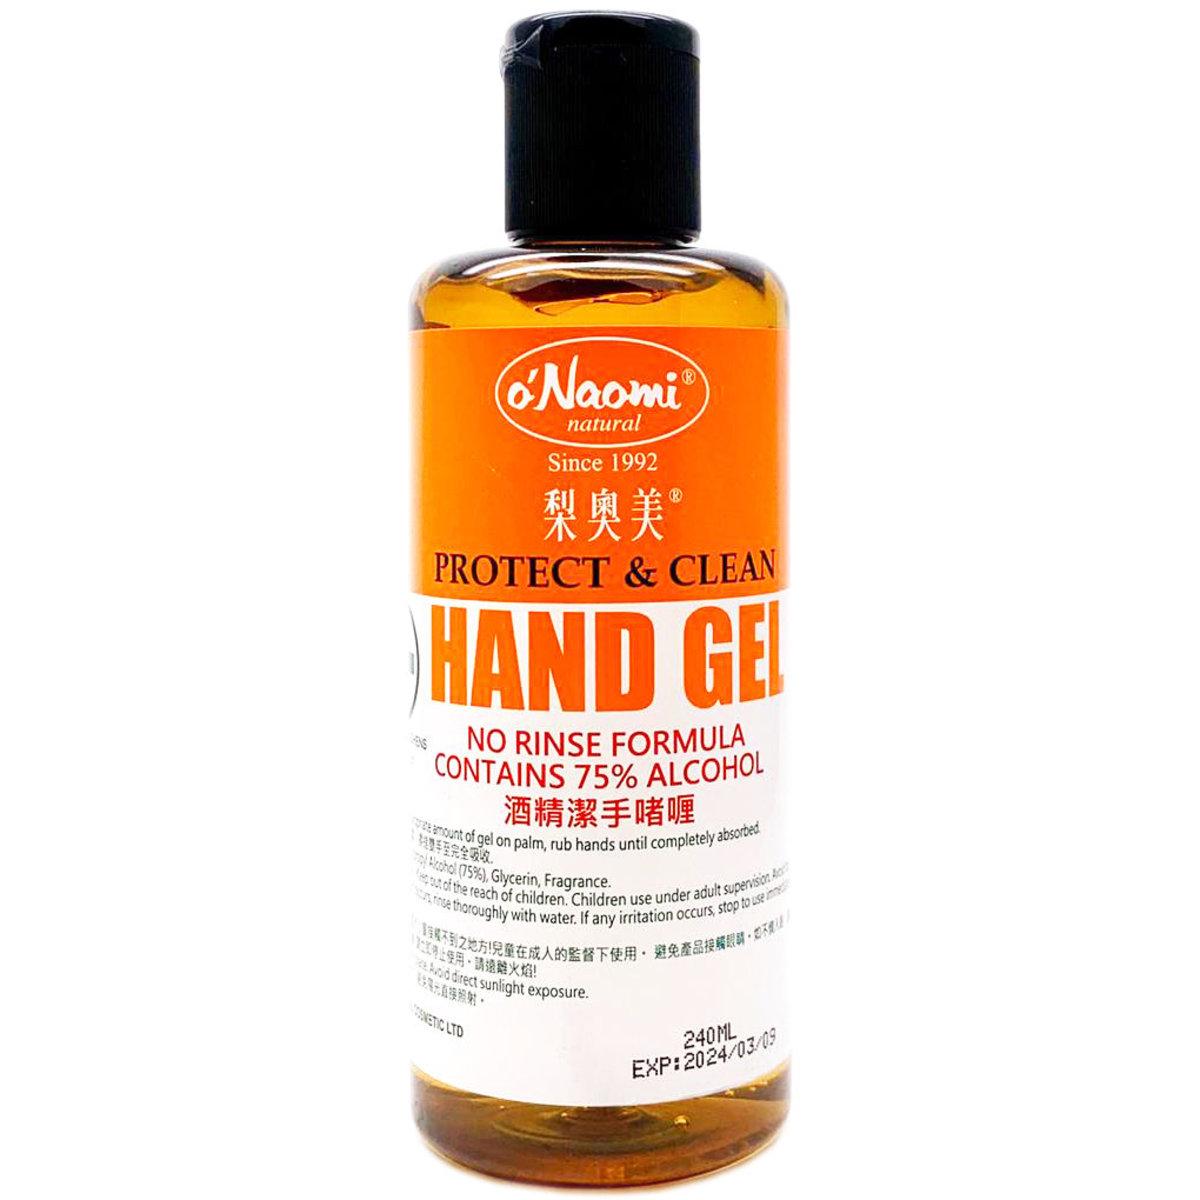 O'NAOMI CLEANSING HAND GEL 240ML